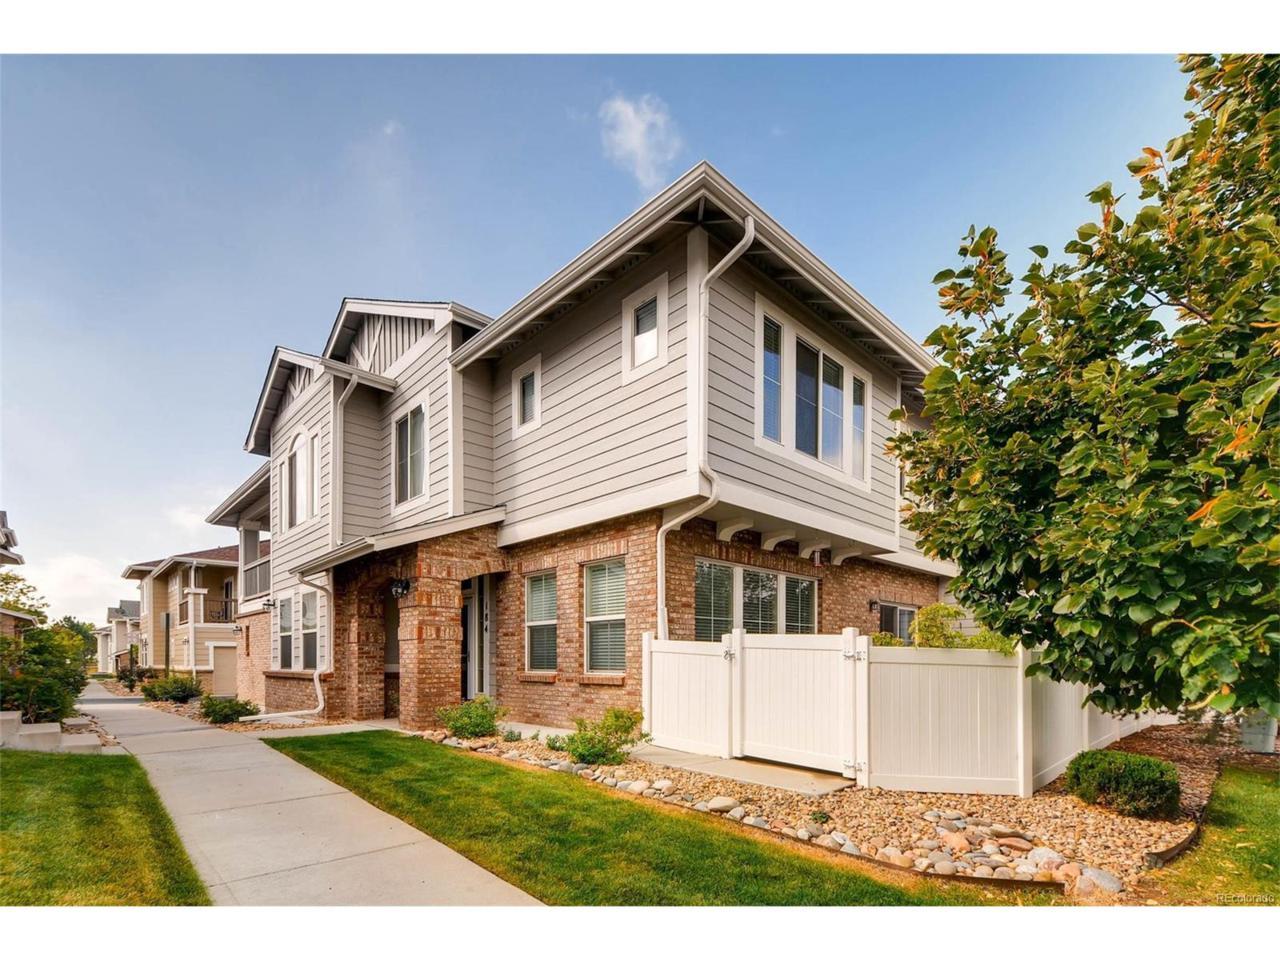 184 Whitehaven Circle, Highlands Ranch, CO 80129 (MLS #2745462) :: 8z Real Estate